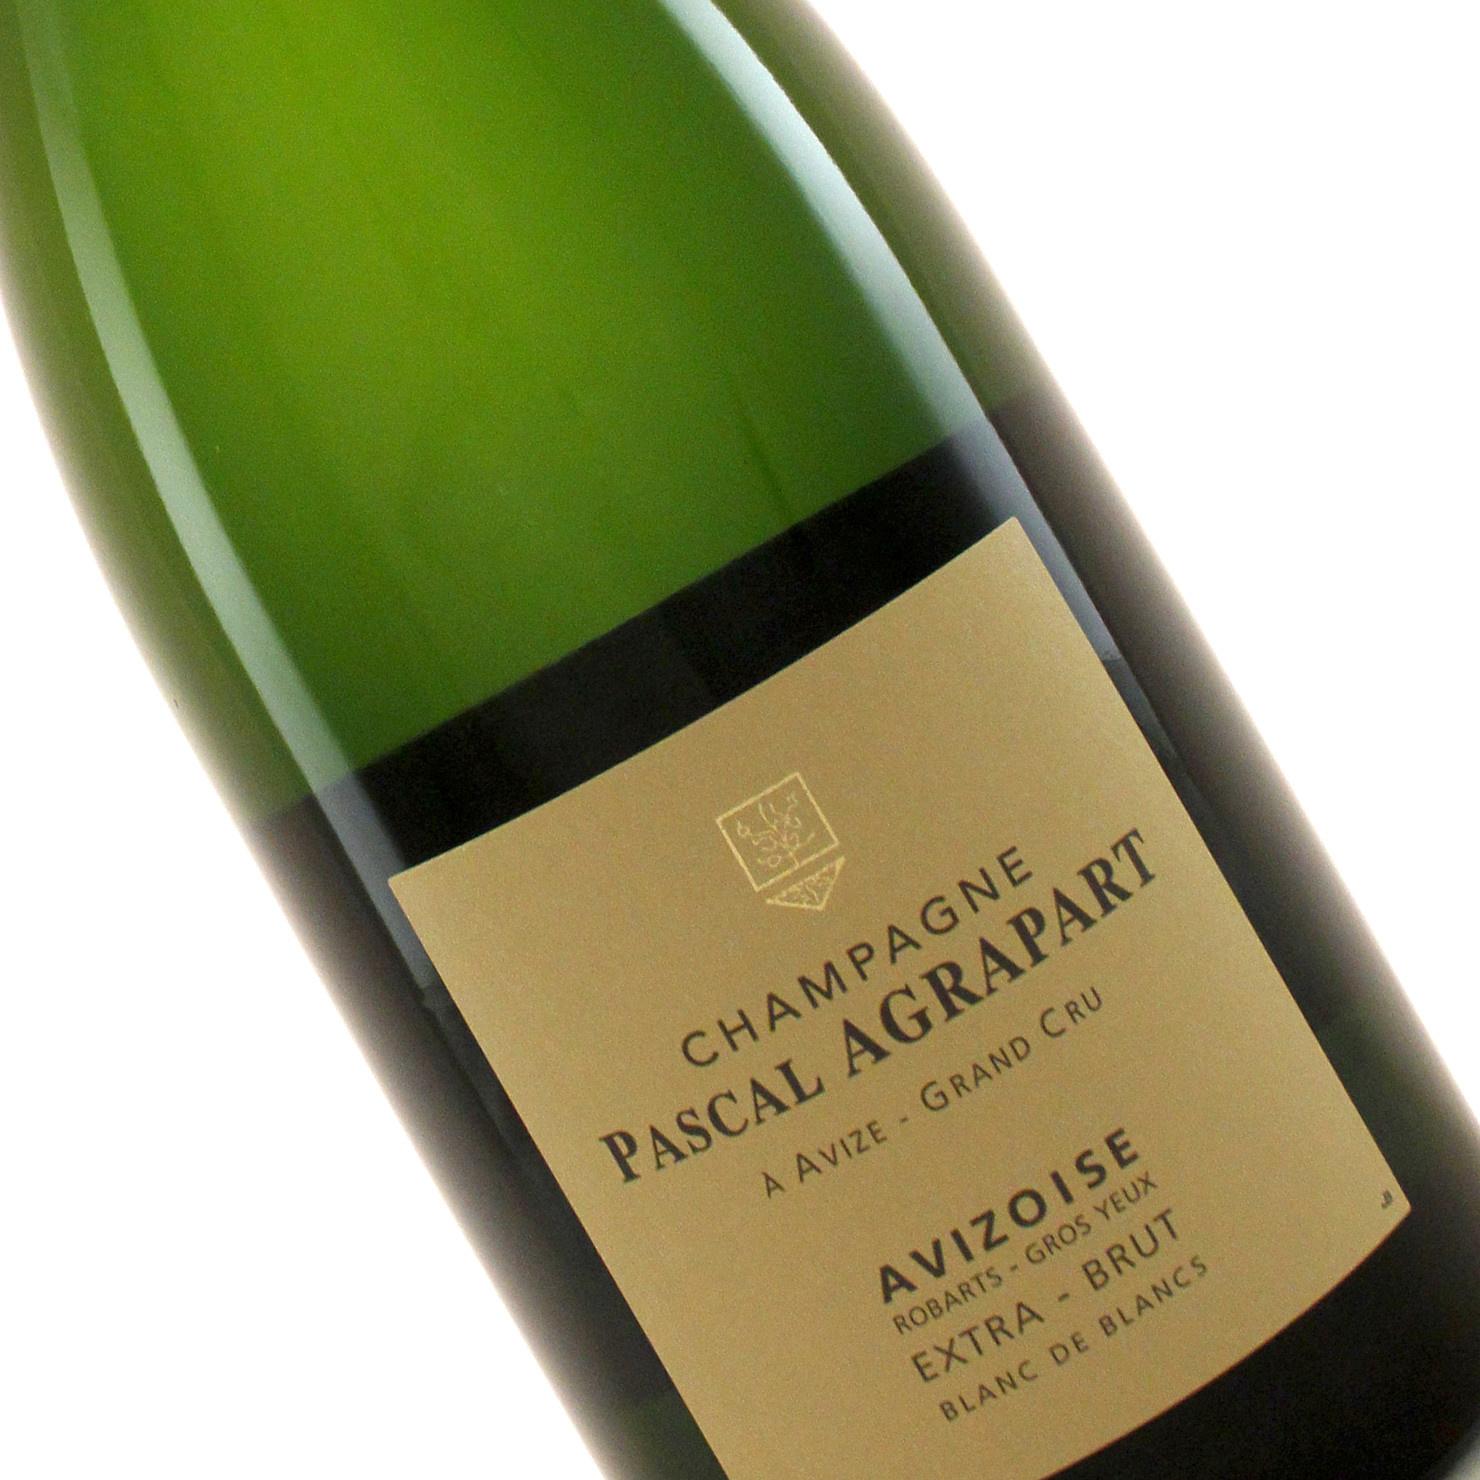 Agrapart & Fils 2012 Avizoise Extra Brut, Champagne